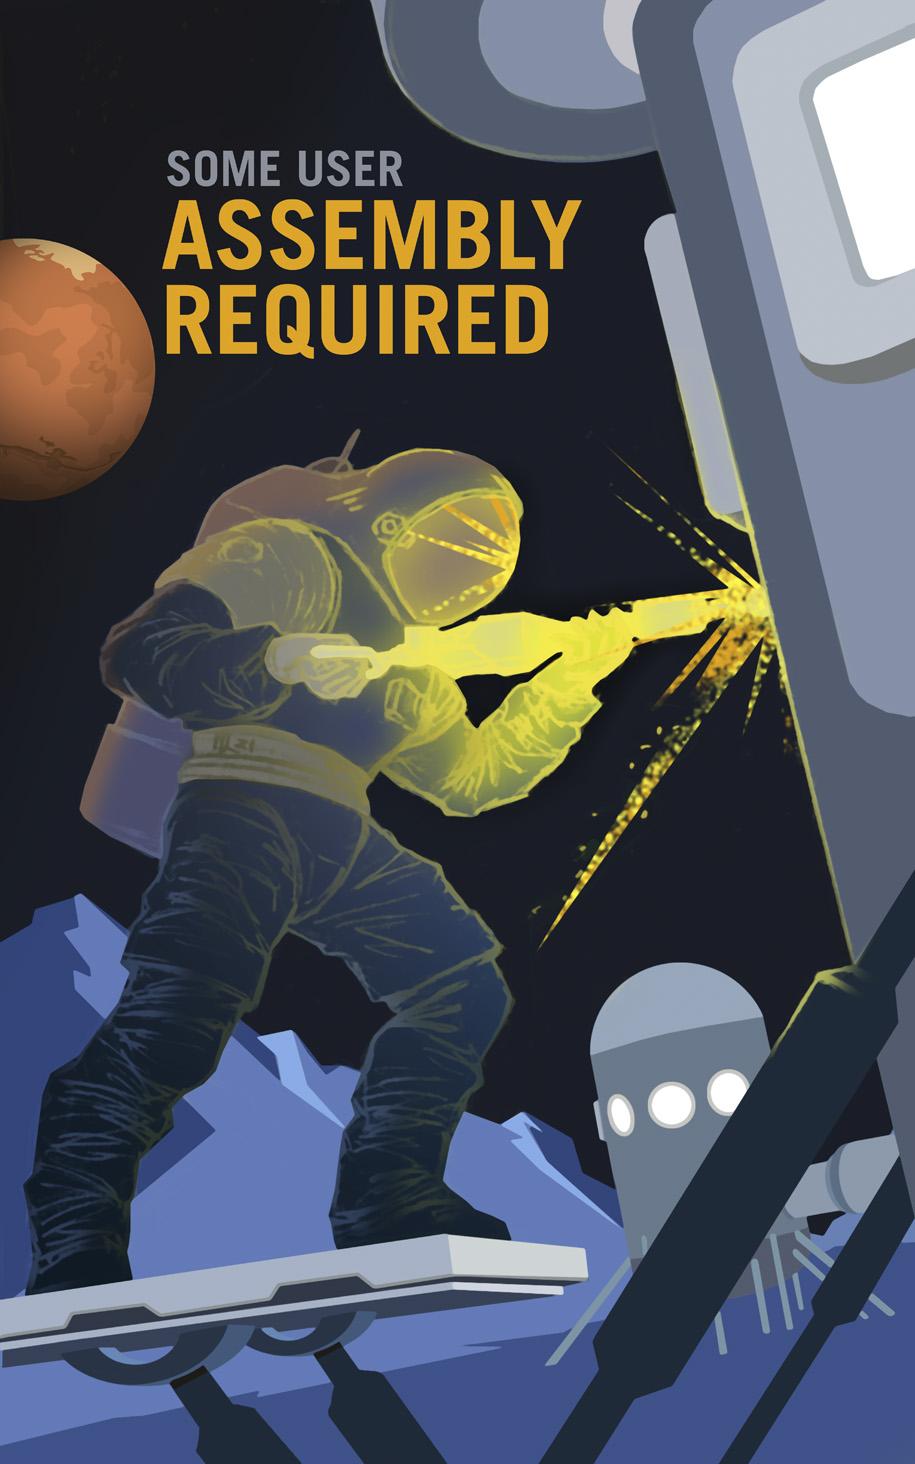 mars-recruitment-posters-nasa-7